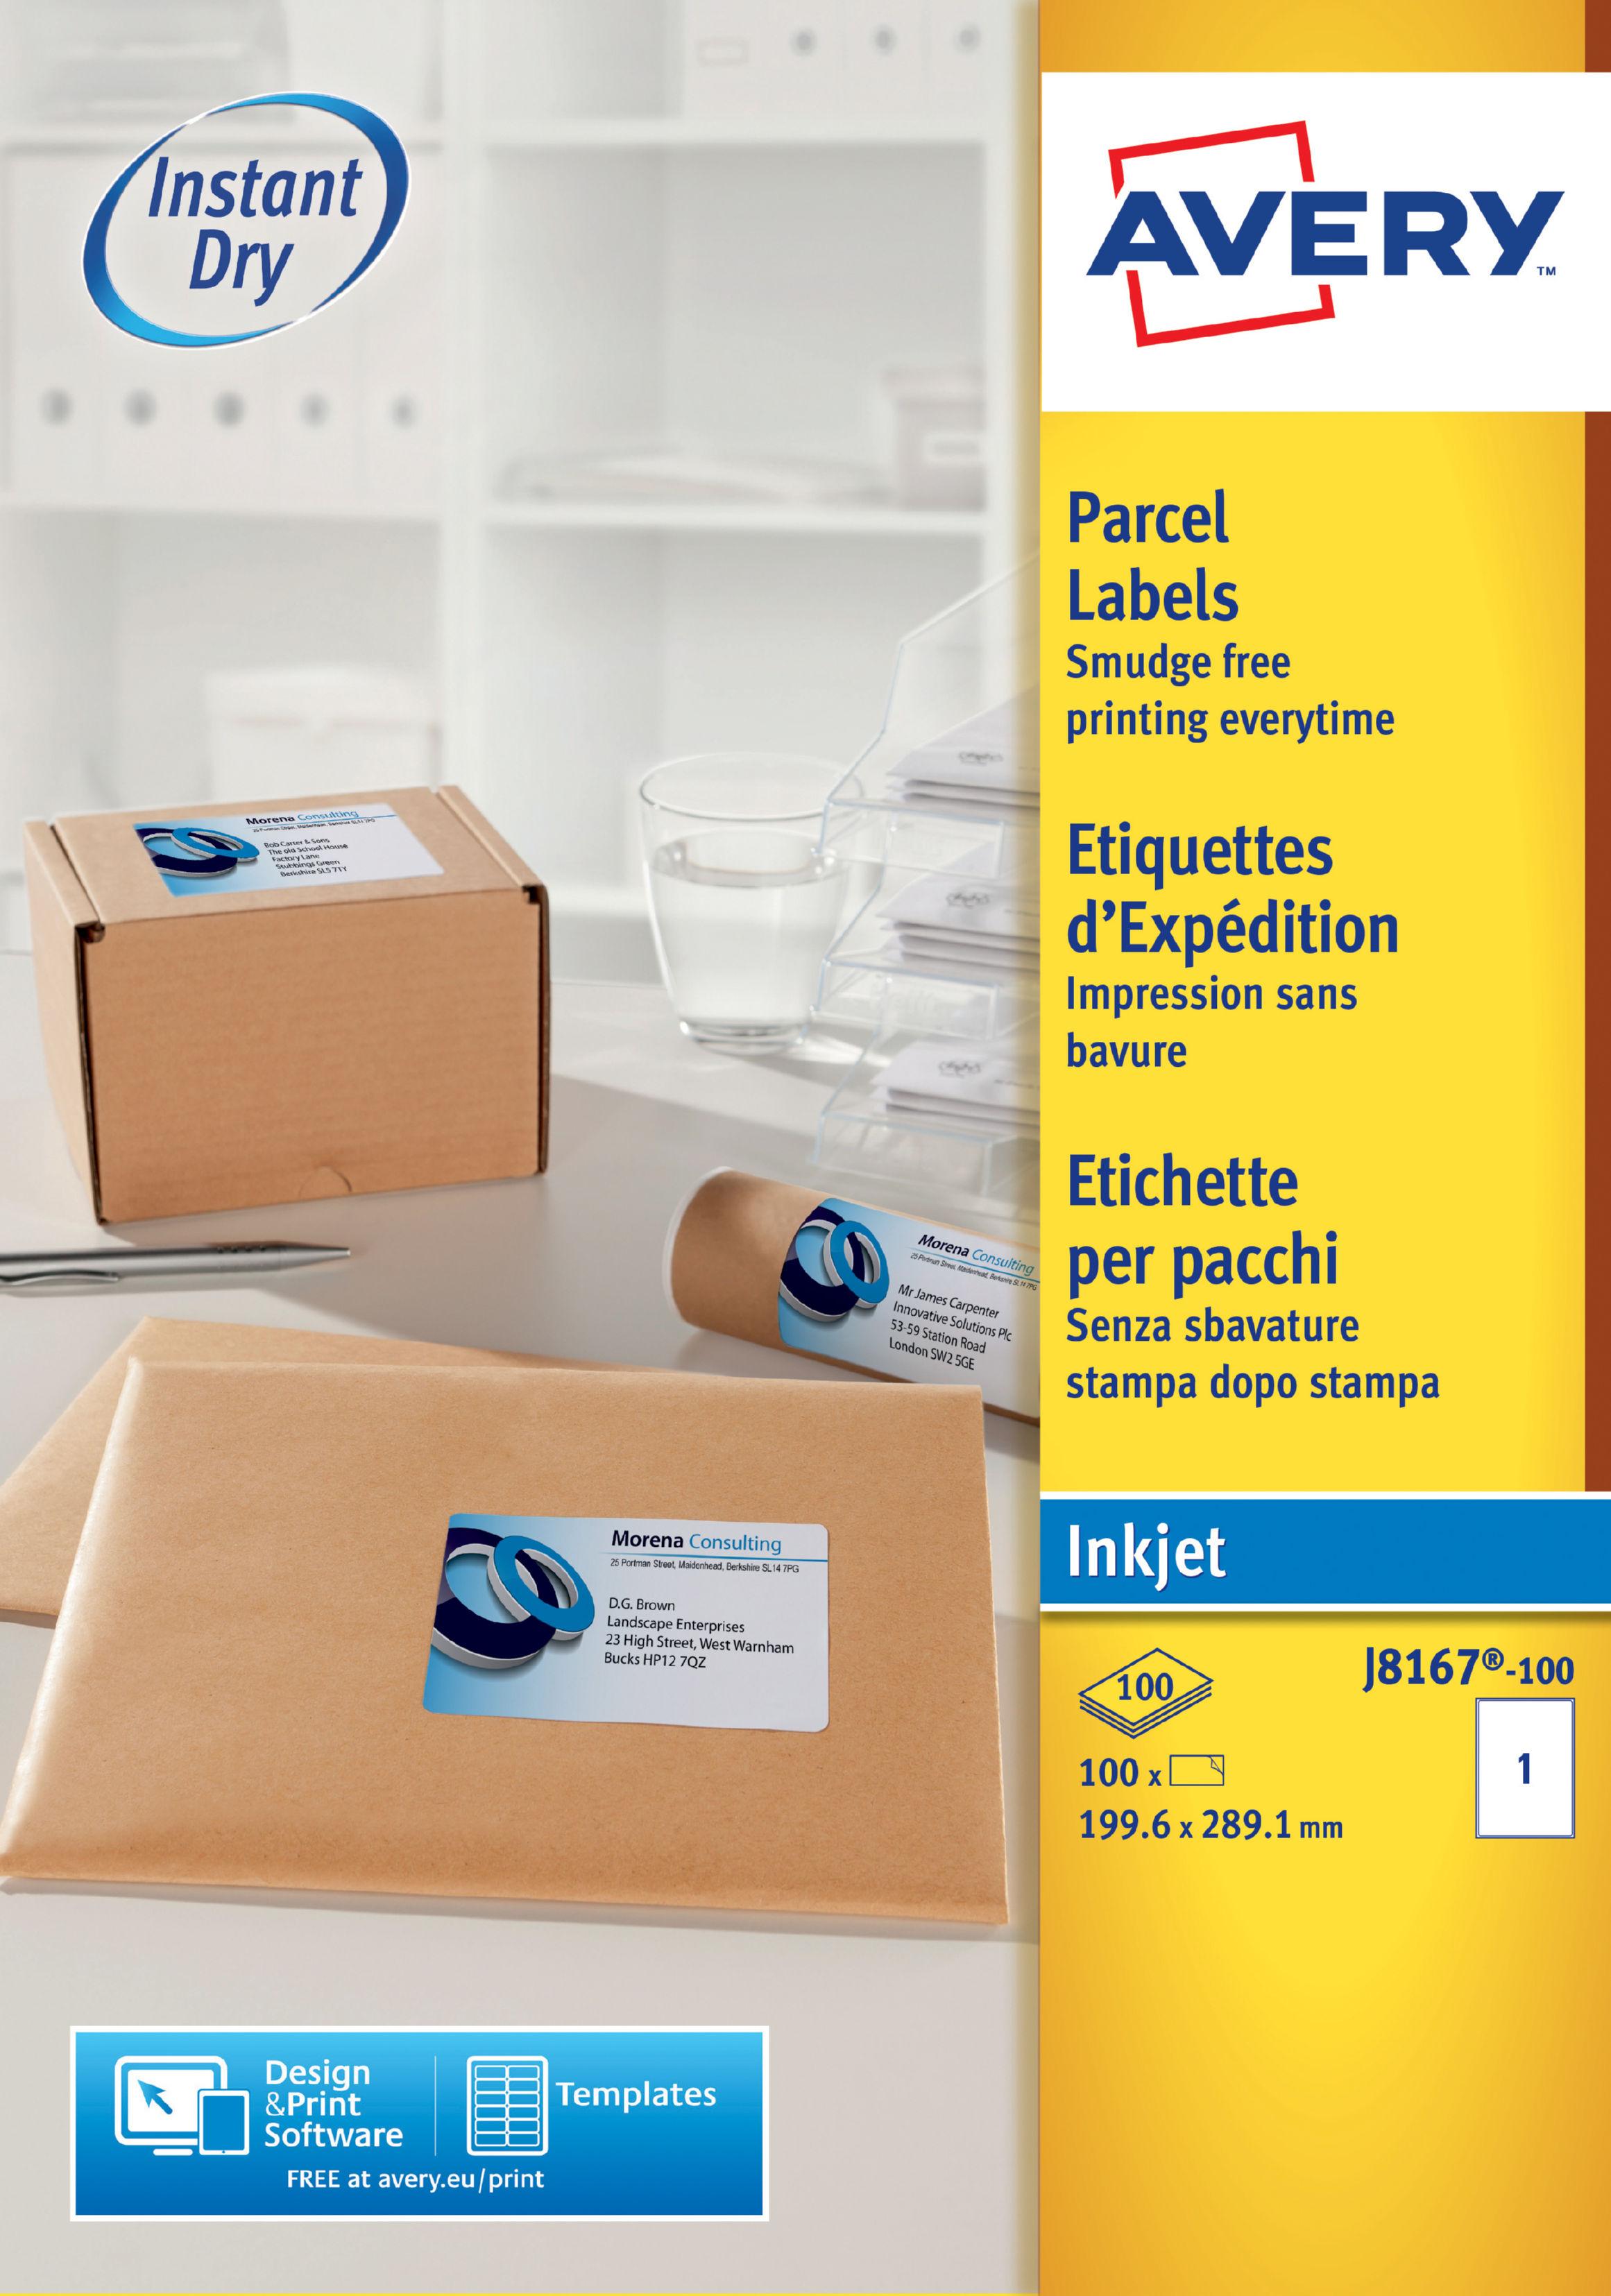 avery inkjet address labels 200x289mm j8167 100 100 labels